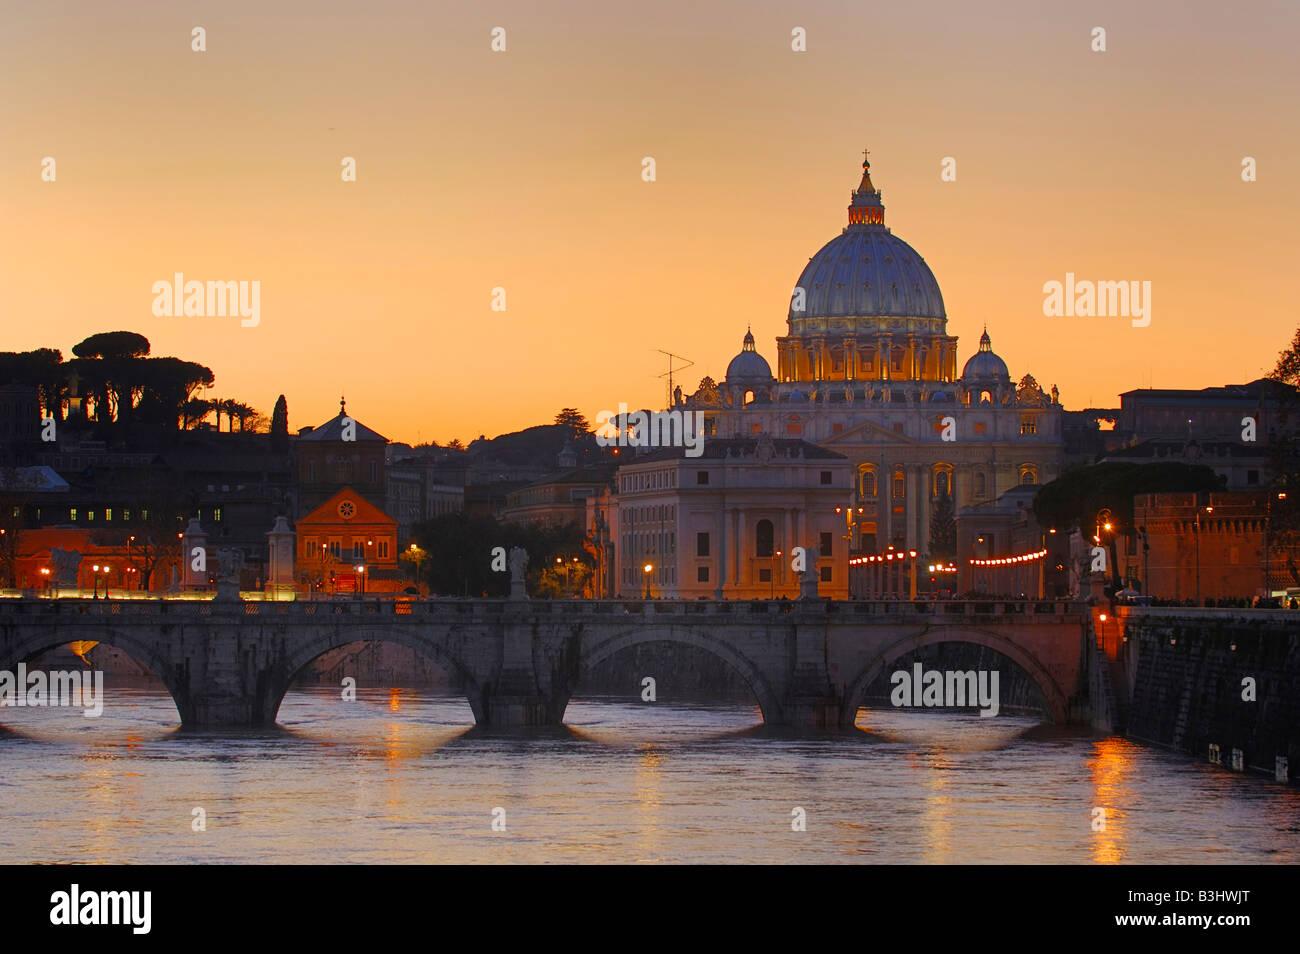 Die Basilika des Heiligen Petrus bei Sonnenuntergang, Rom, Italien Stockbild